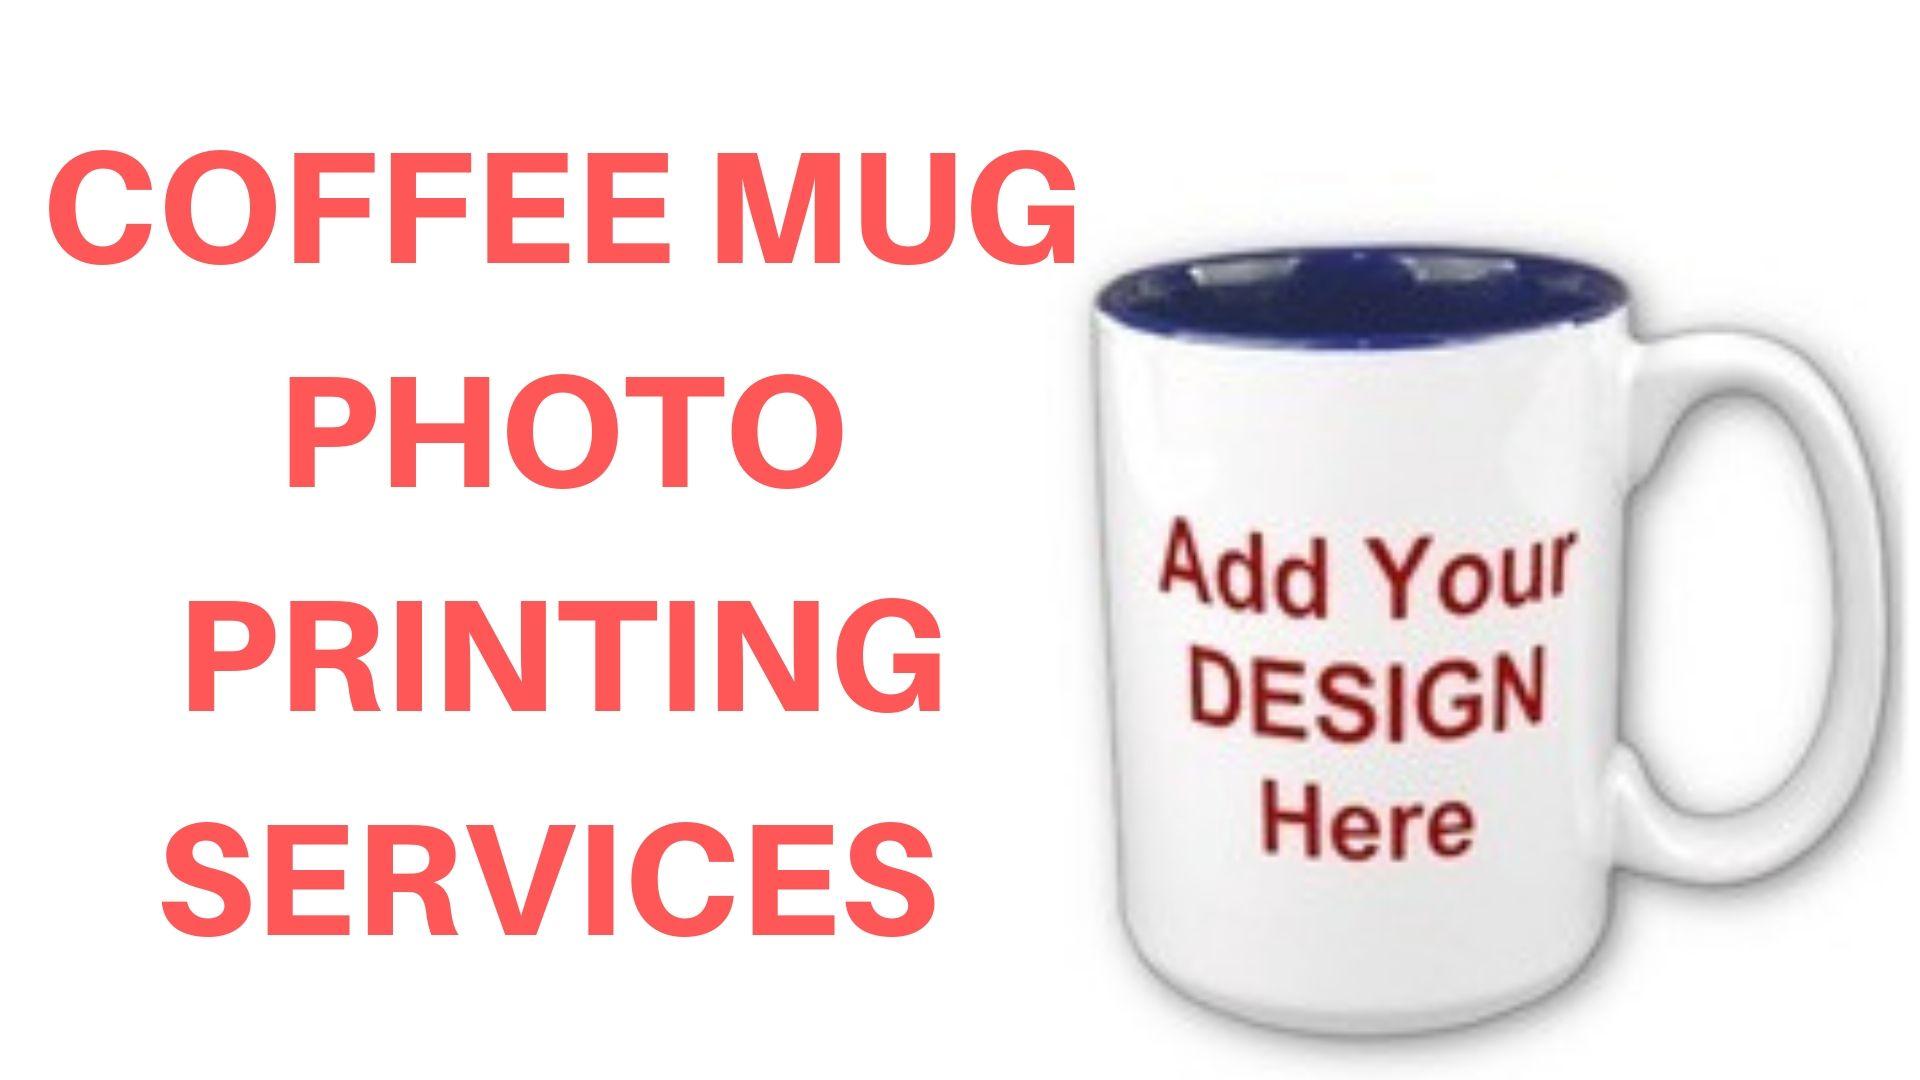 coffee mug photo printing services in madhapur hyderabad